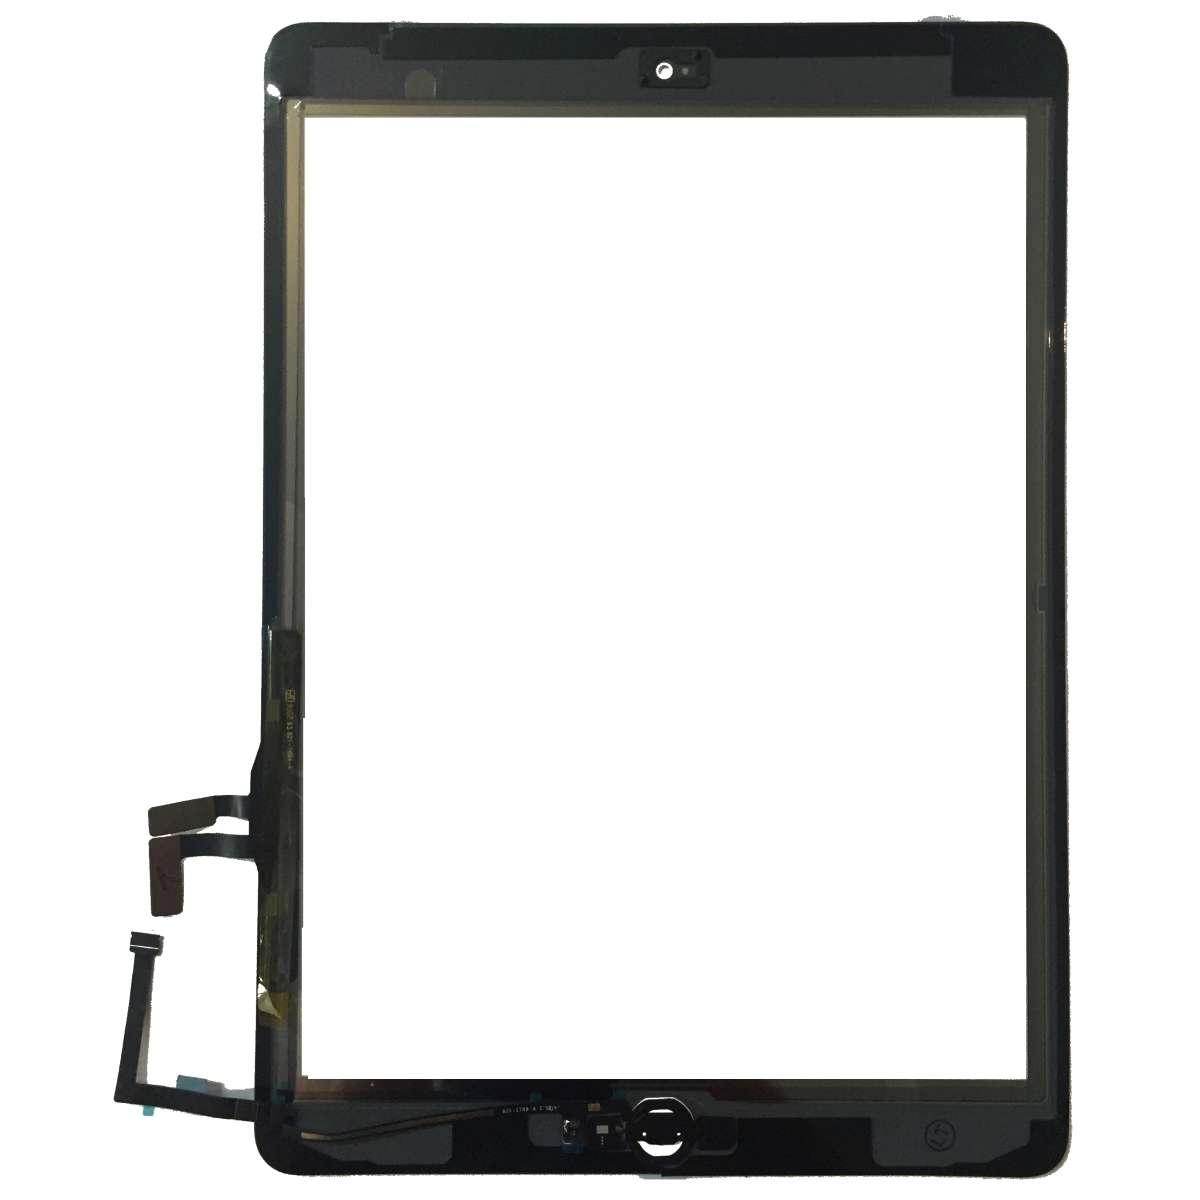 Touchscreen Digitizer Apple iPad 5 A1822 cu buton home si adeziv Alb Geam Sticla Tableta imagine